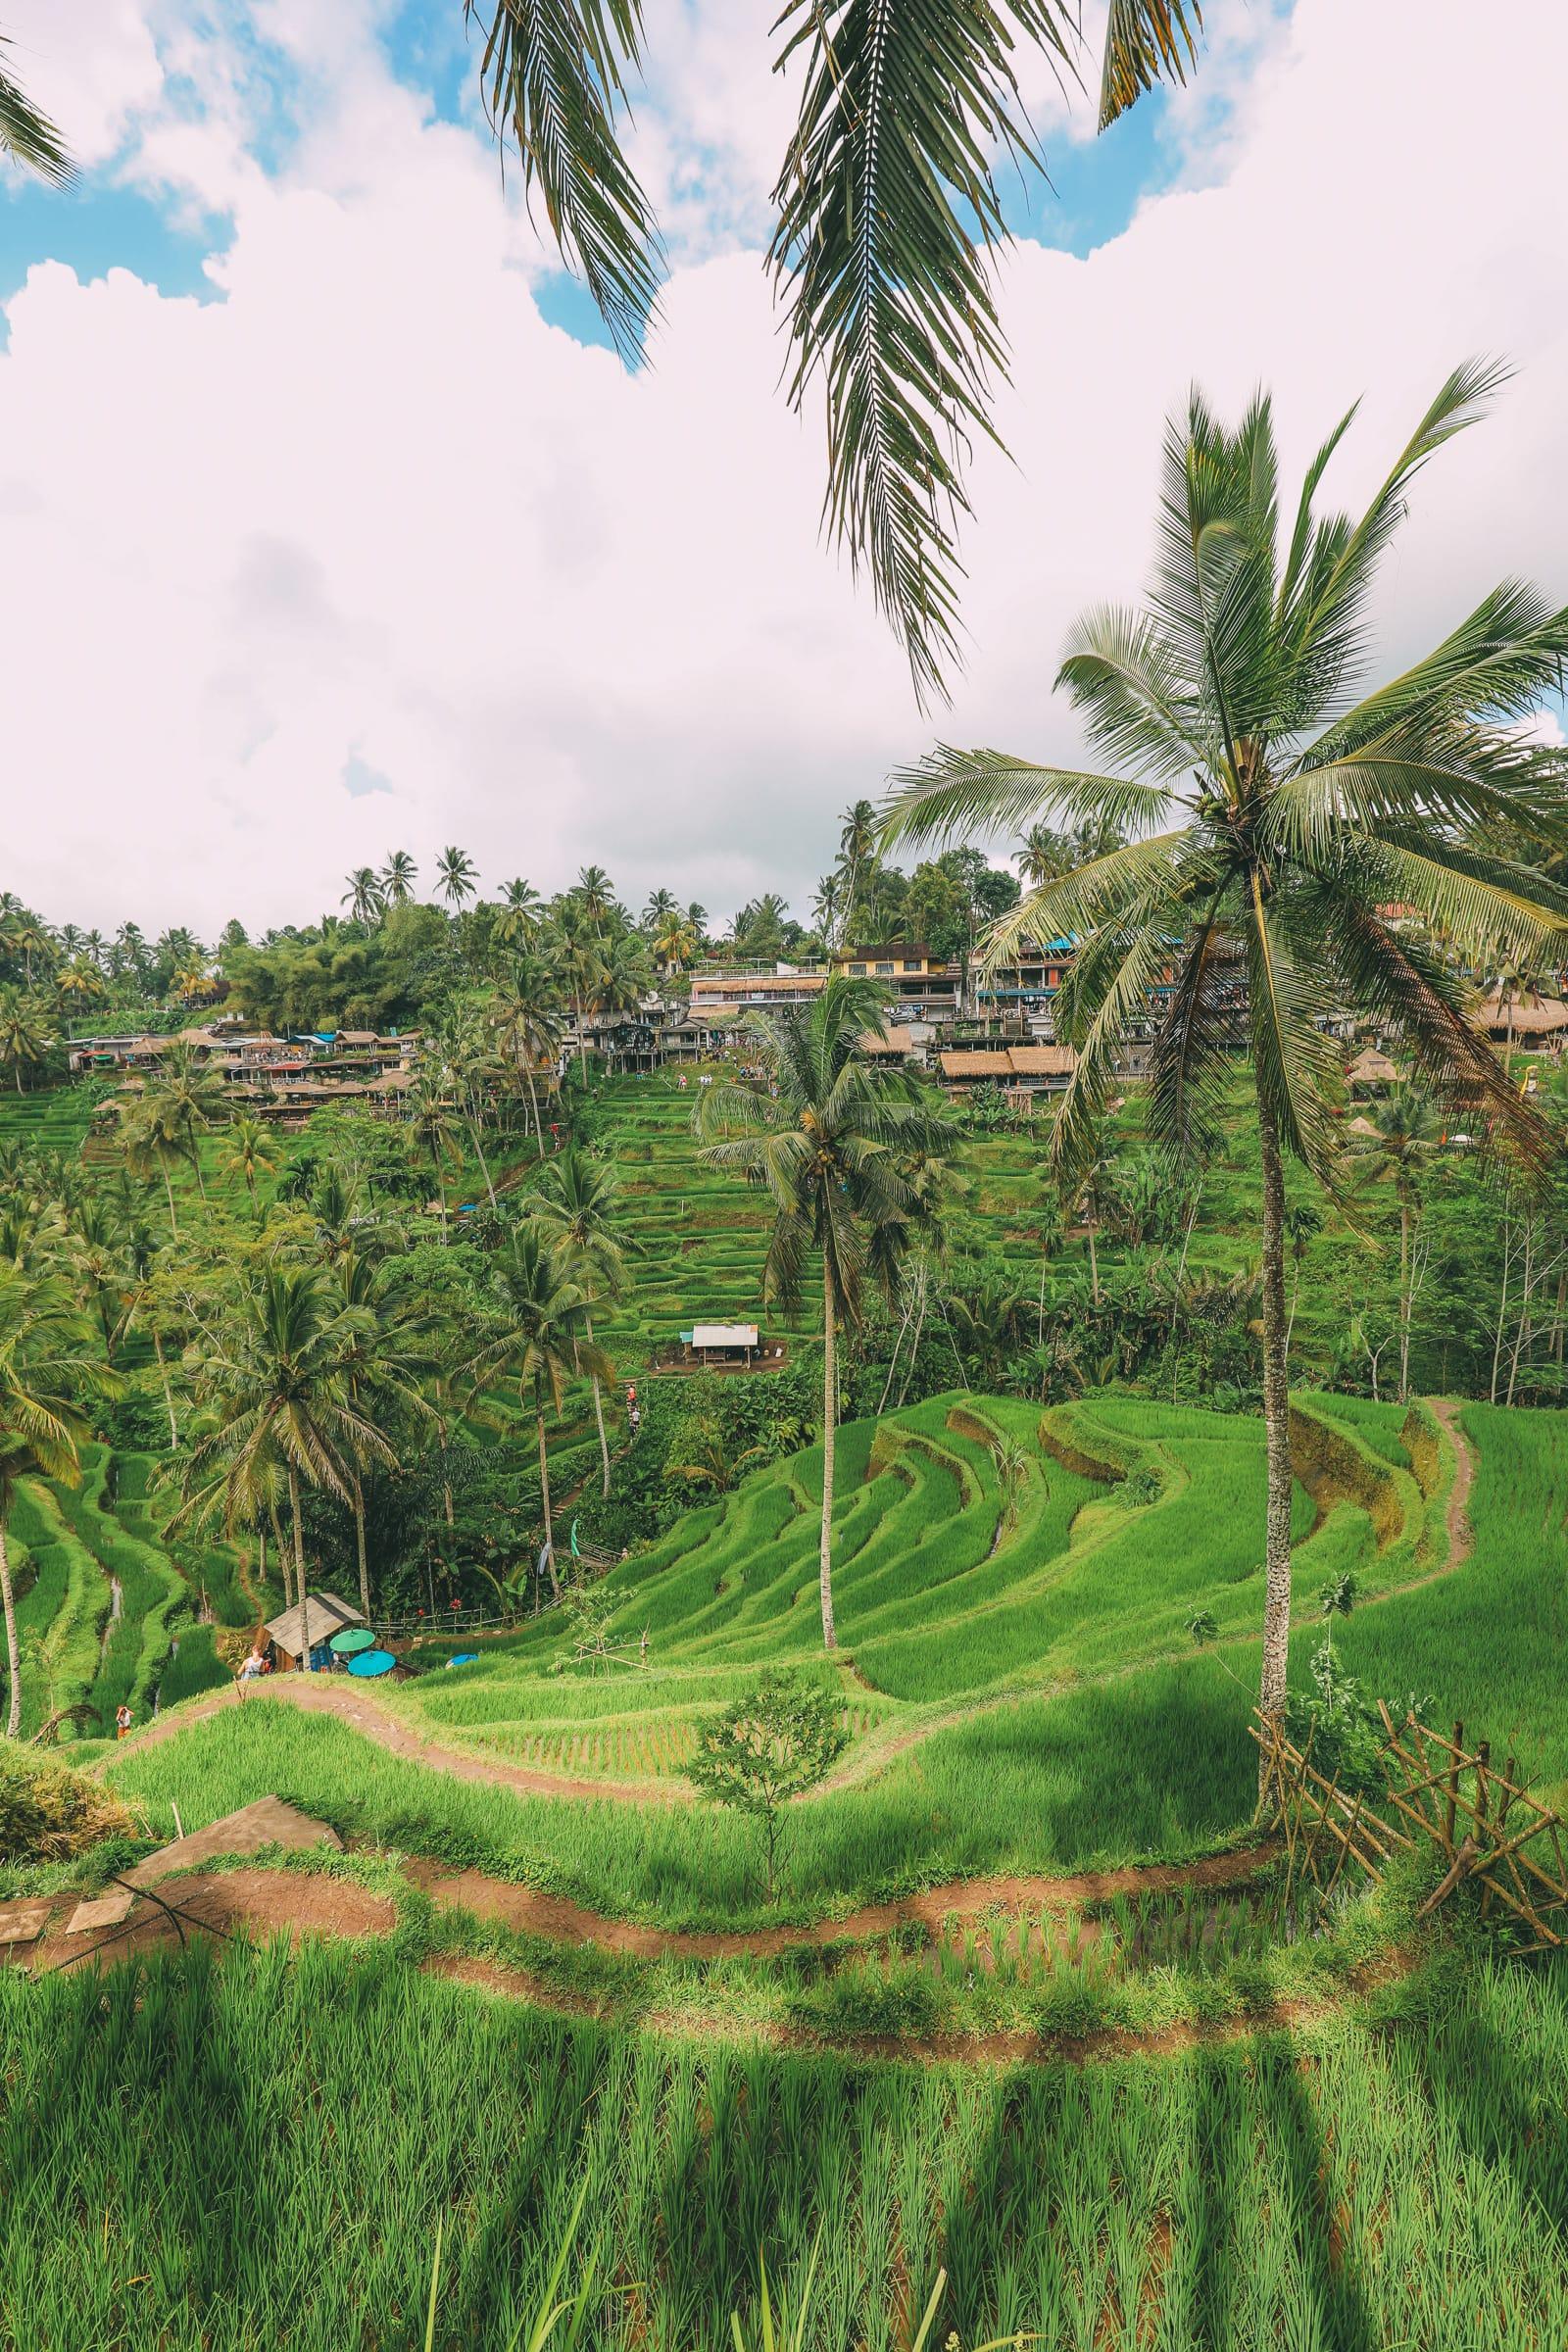 Bali Travel - Tegalalang Rice Terrace In Ubud And Gunung Kawi Temple (15)